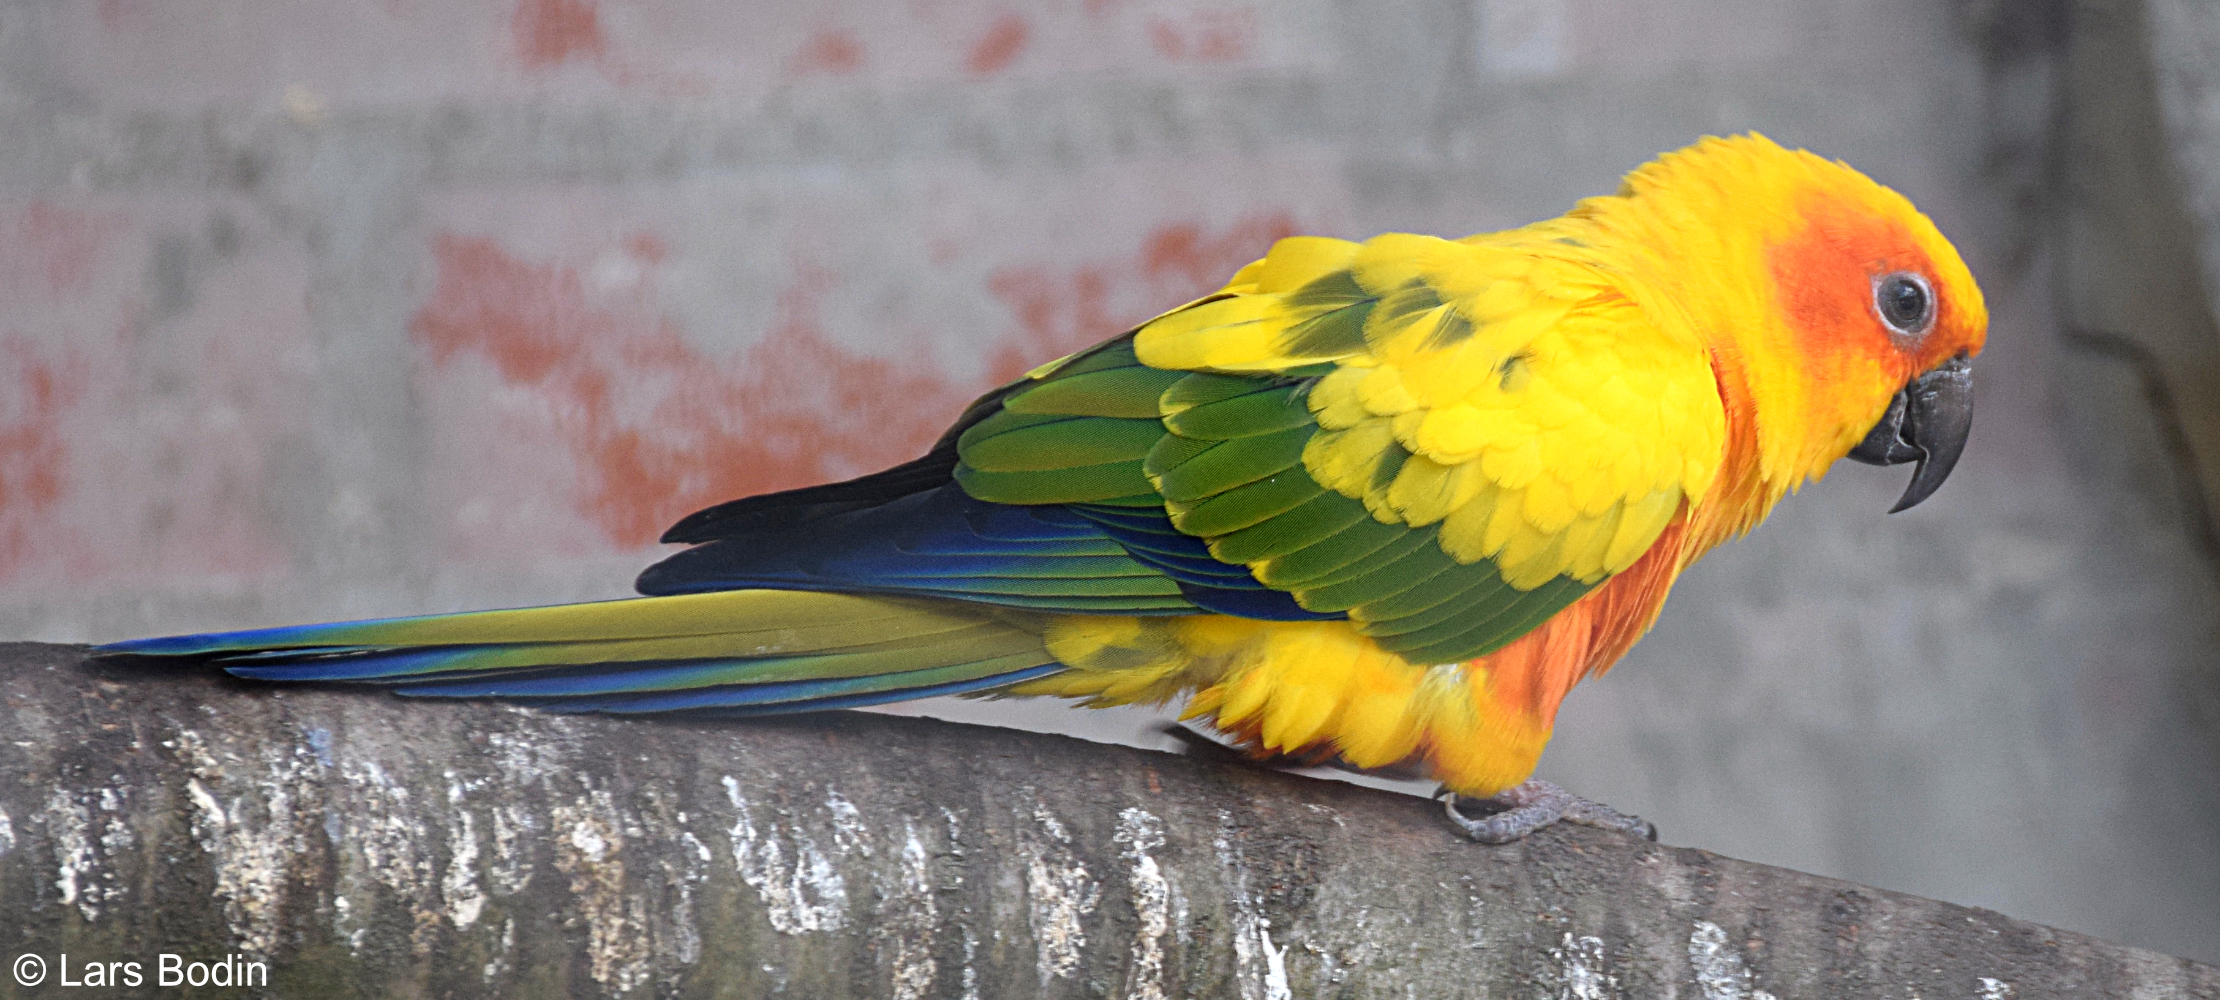 Aratinga solstitialis - Sun Parakeet. Copyright © Lars Bodin